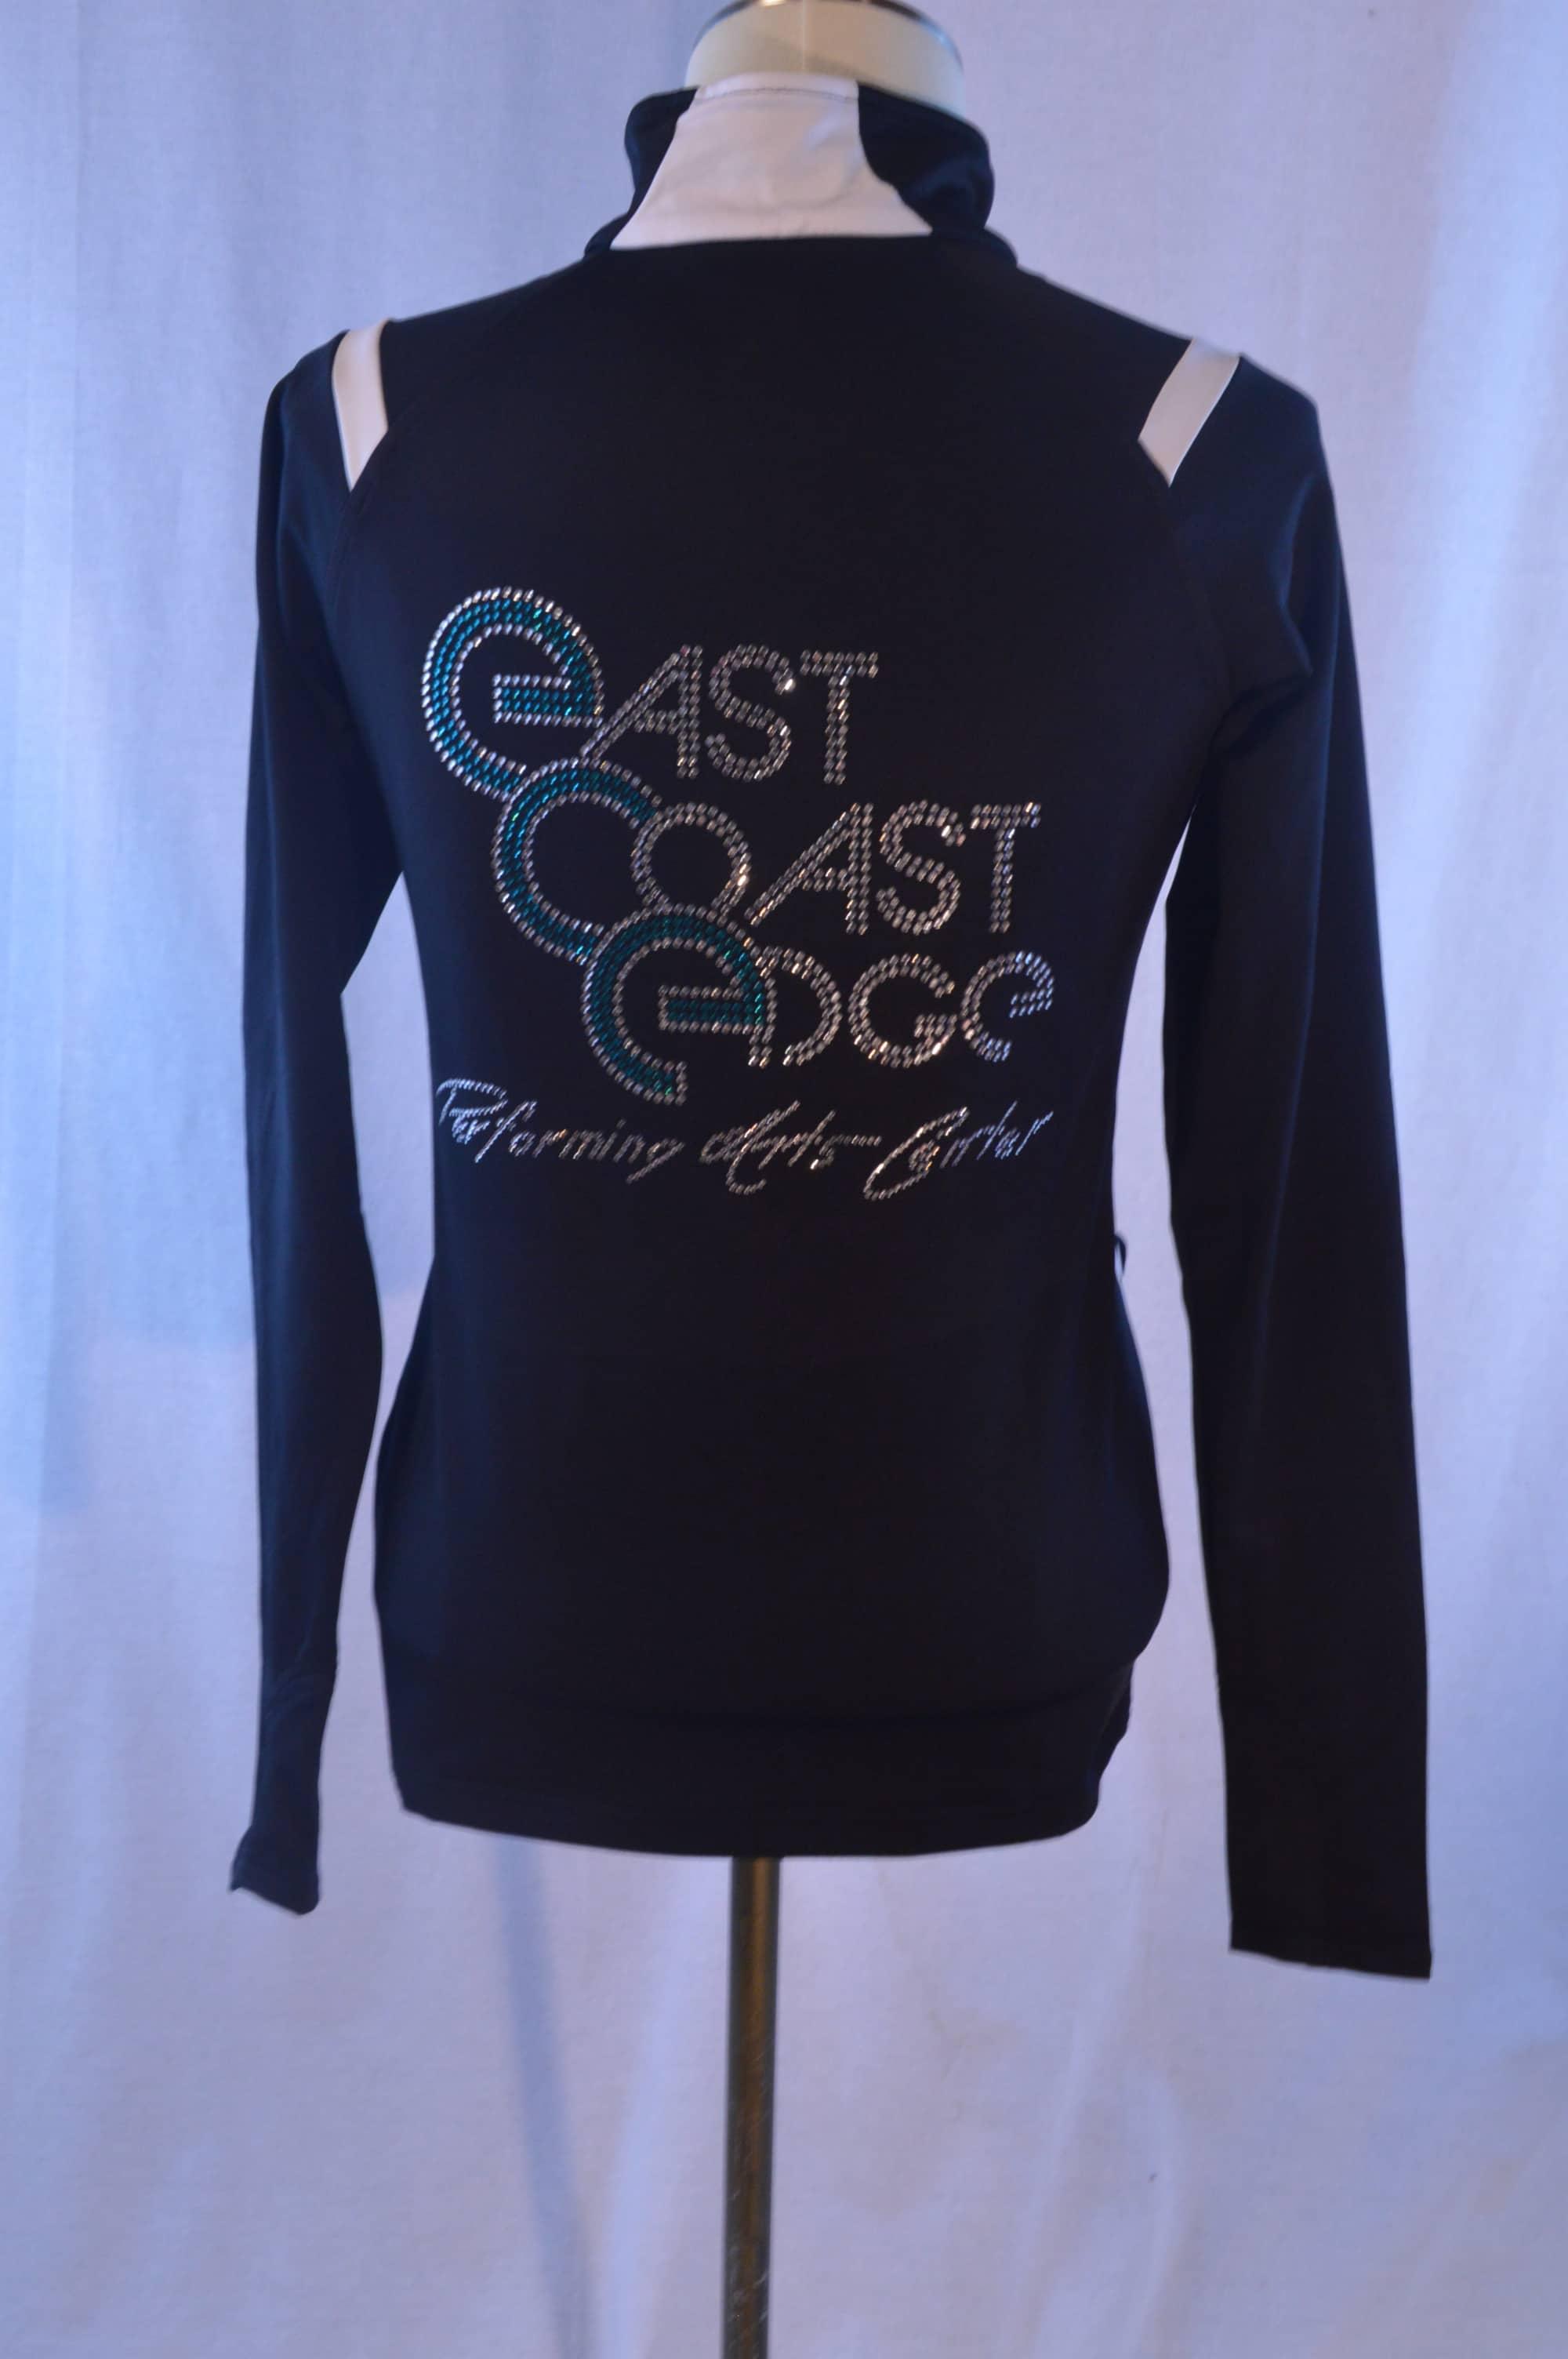 a5d39ec2af148 Dance team jackets East Coast Edge Dance Team Jacket